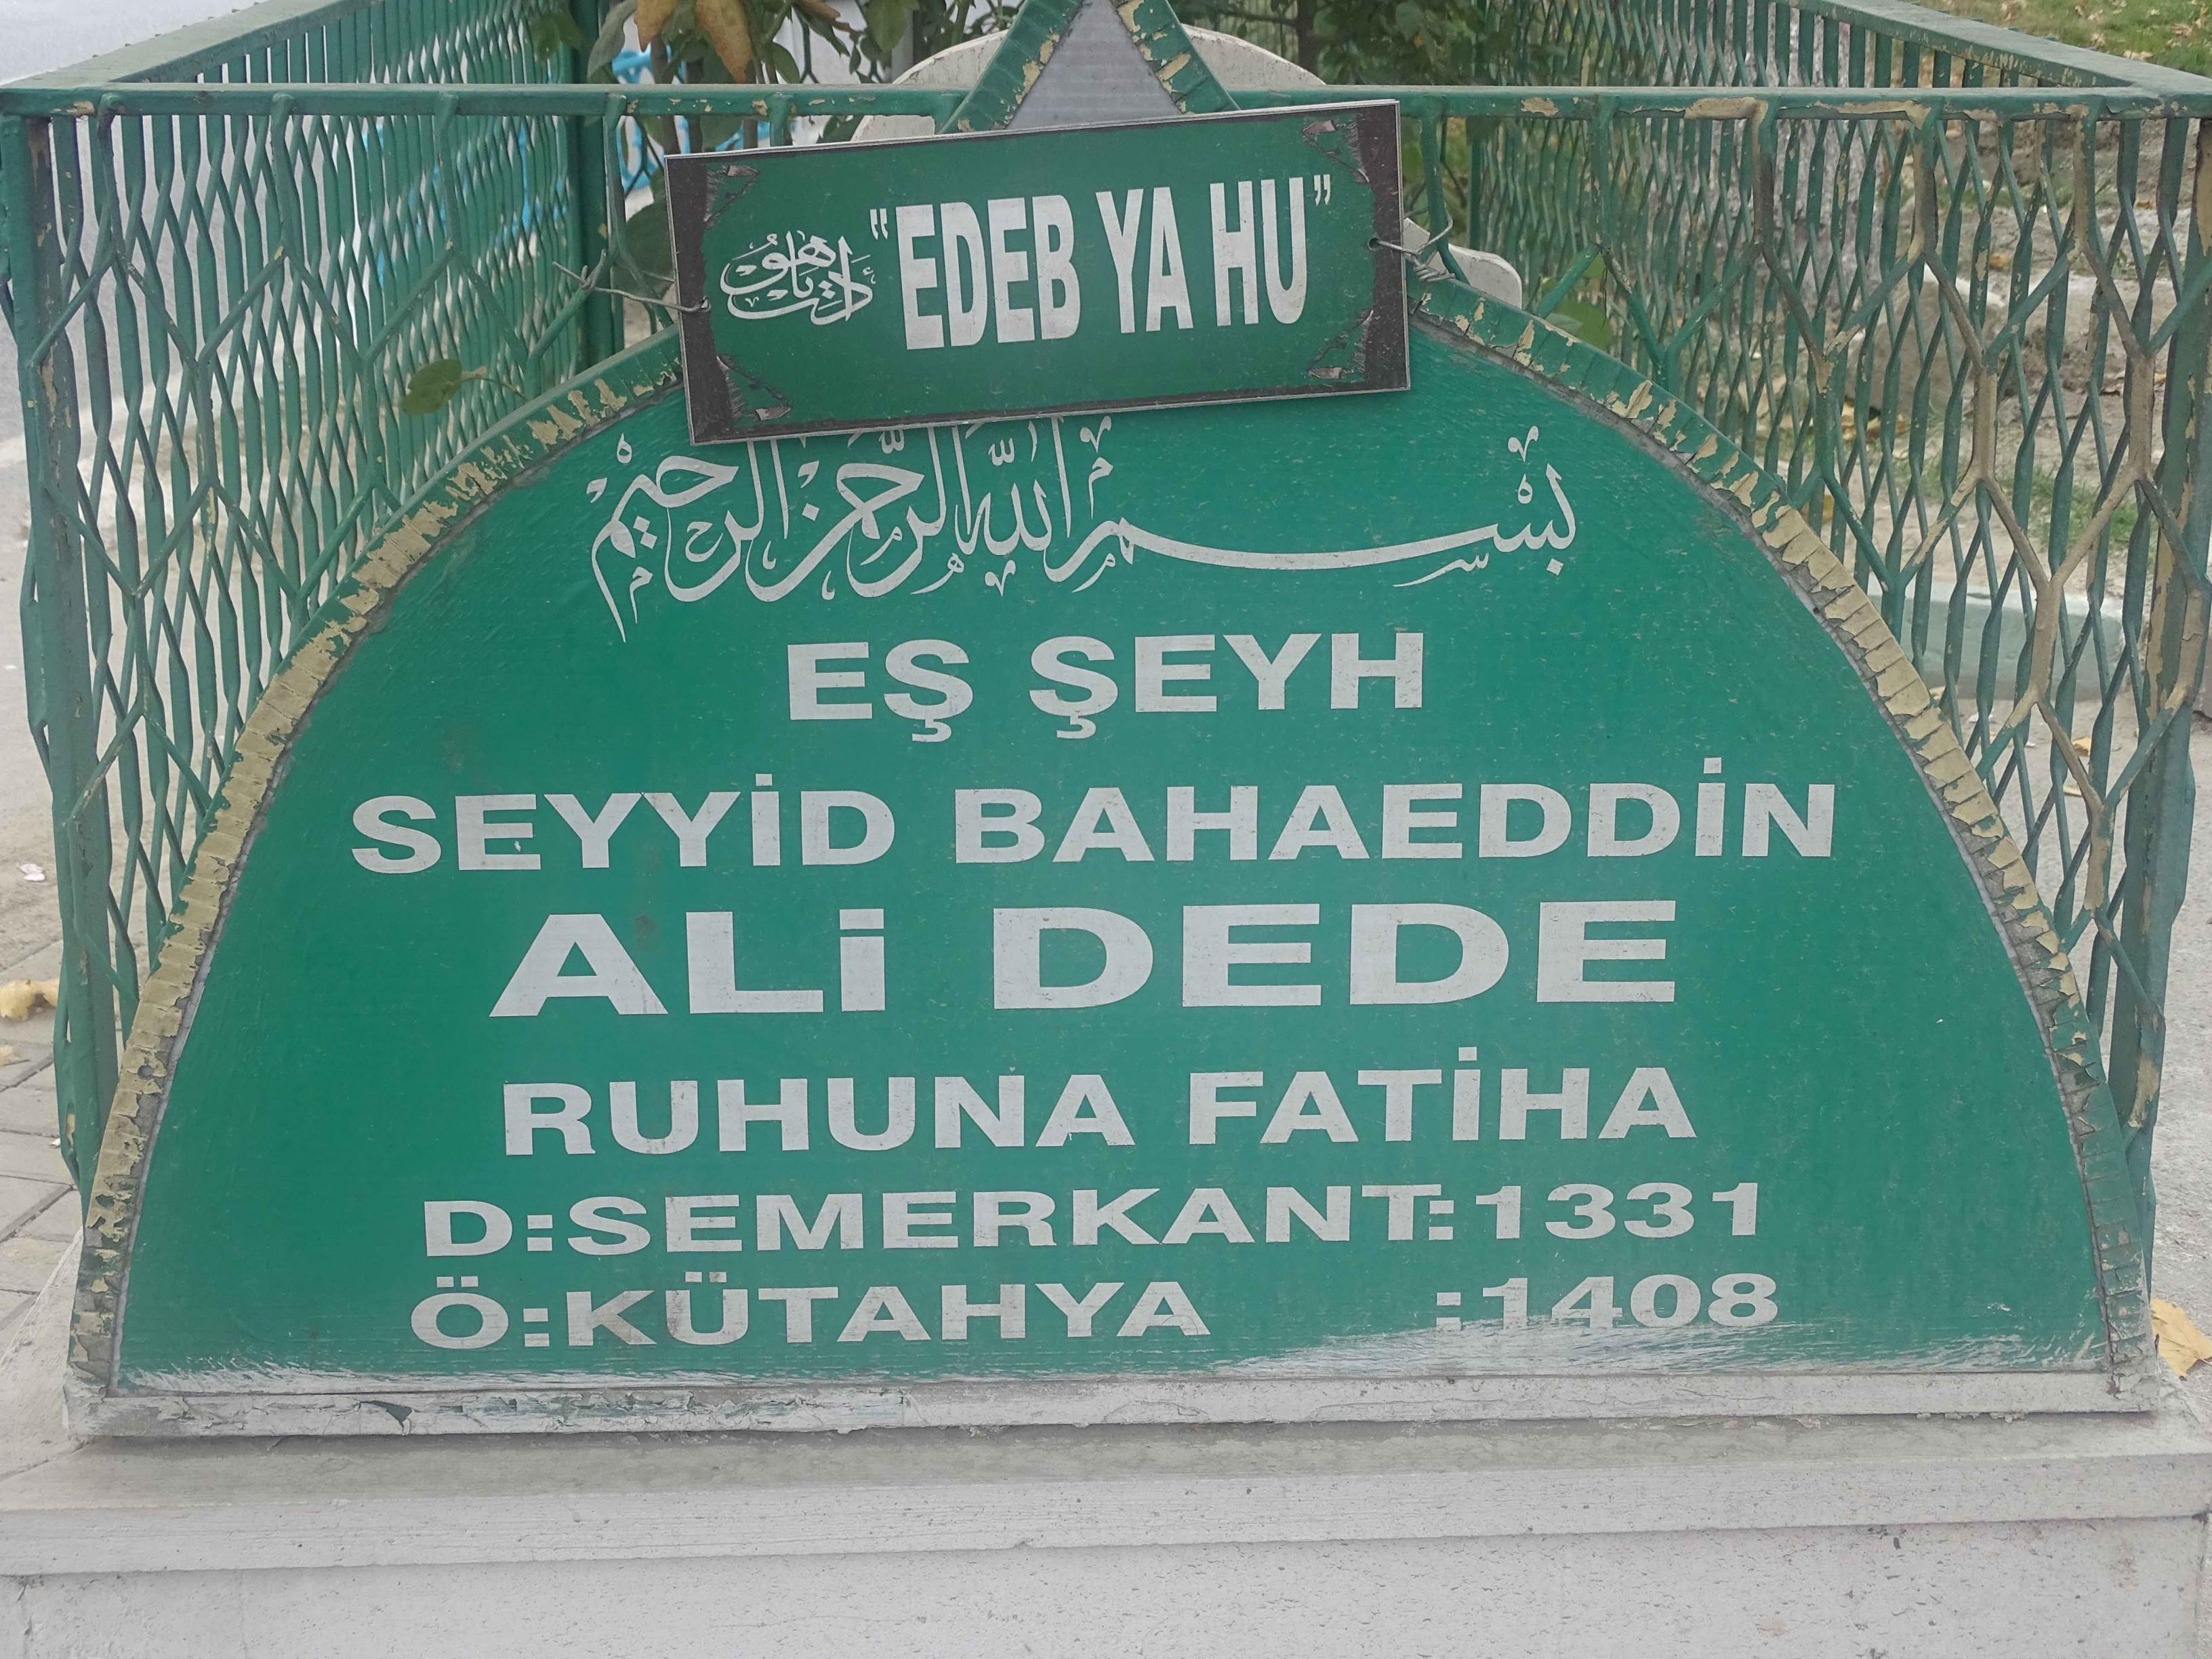 Seyyid Bahaeddin Ali Baba 2